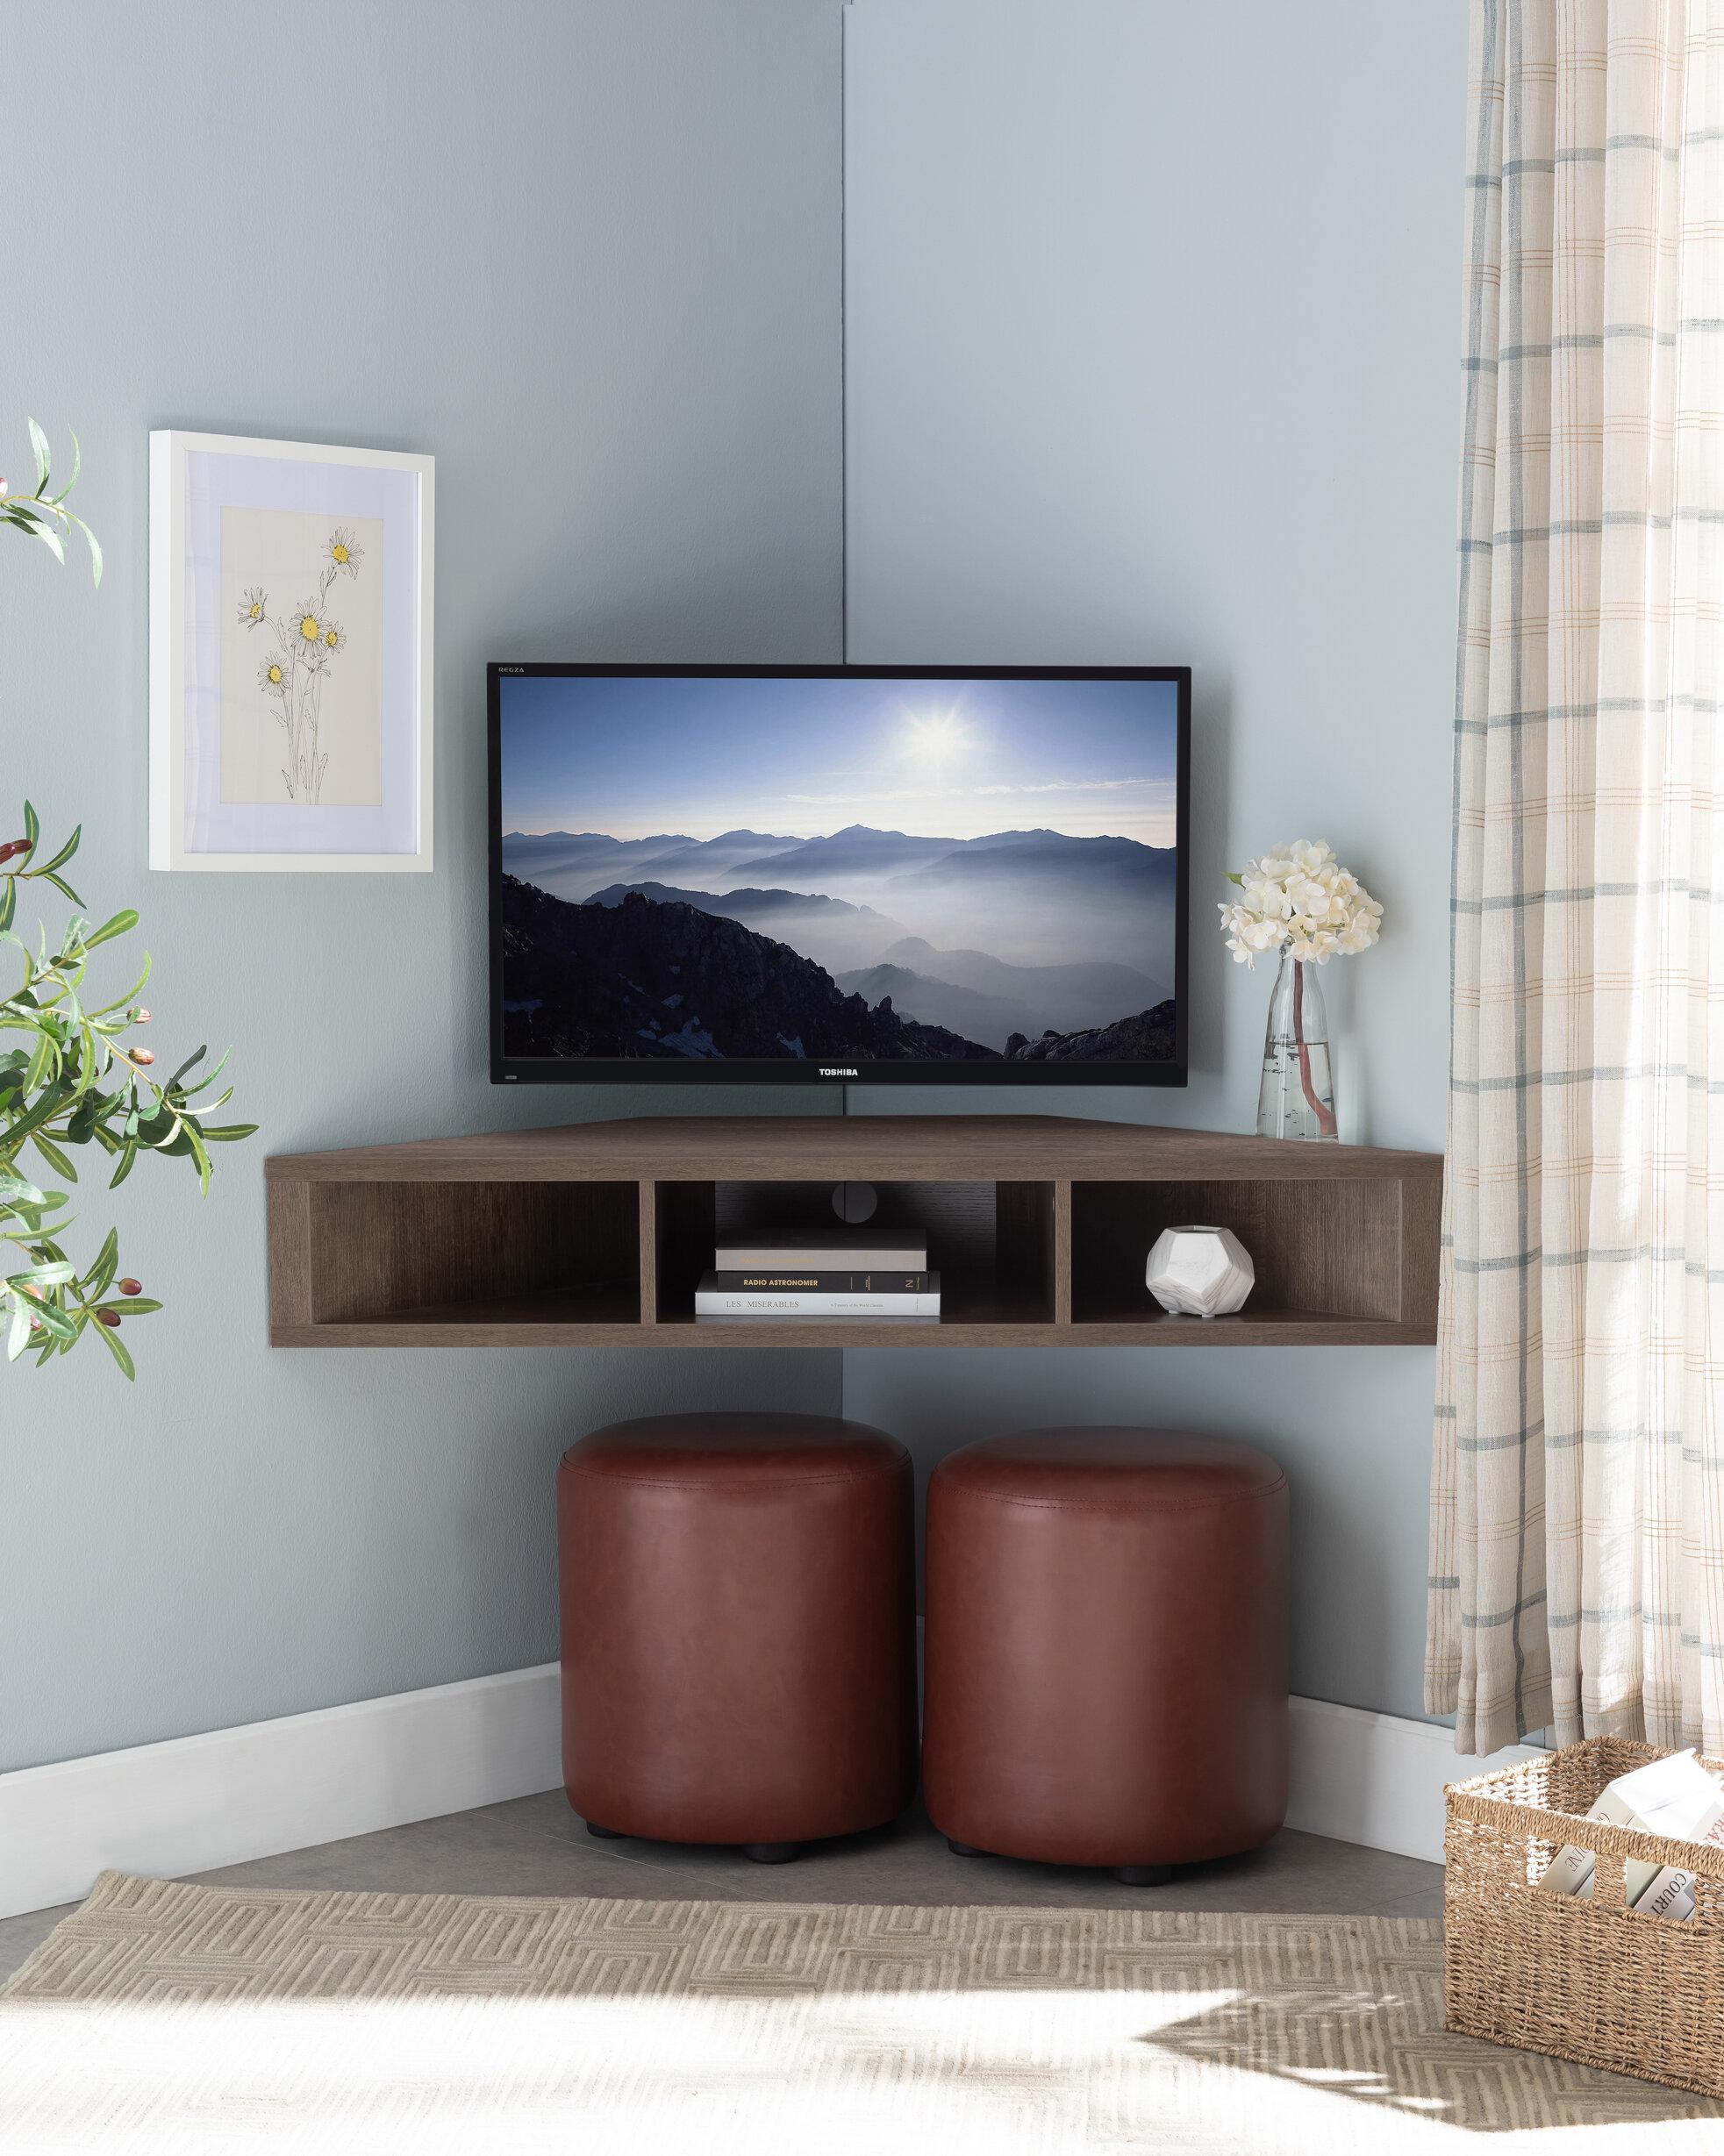 corner tv table designs for living room – ksa g.com